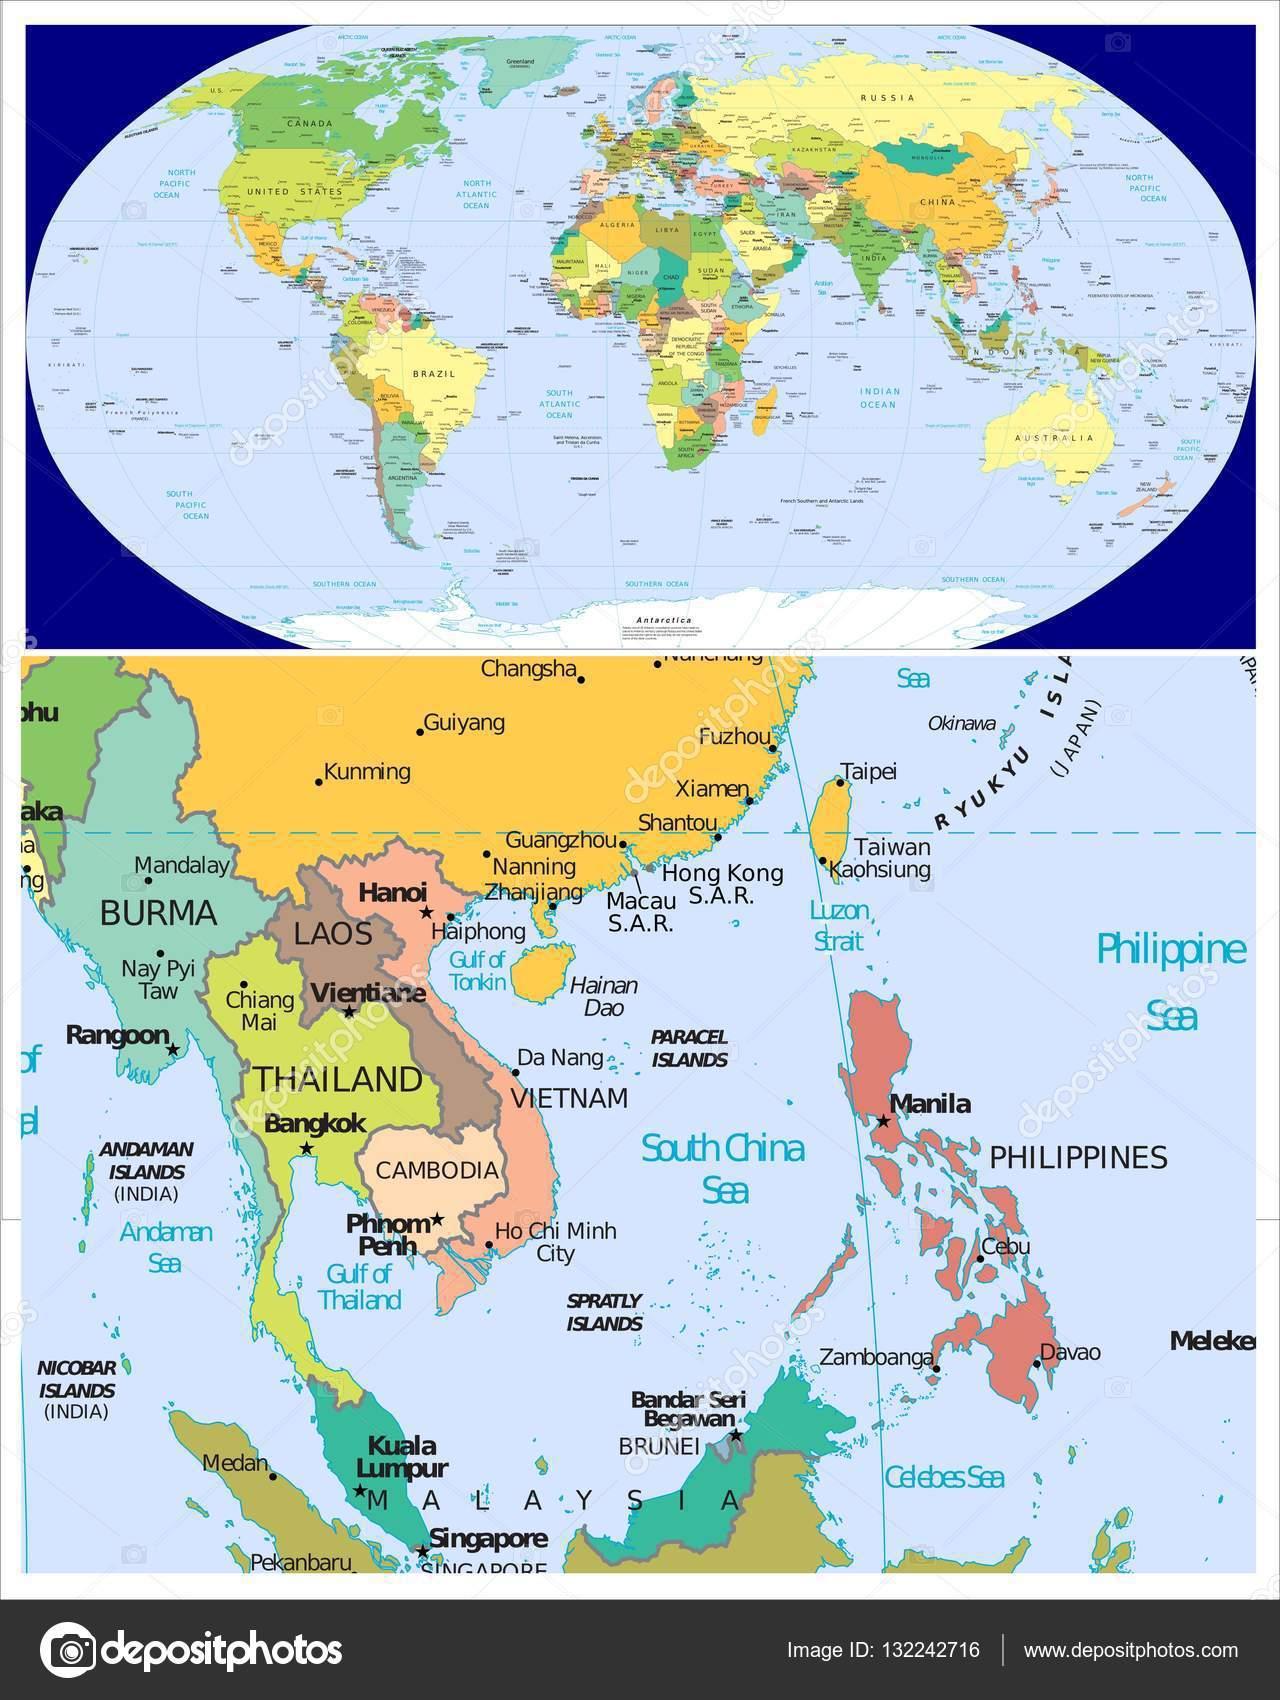 Burma laos thailand cambodia vietnam philippines and world stock burma laos thailand cambodia vietnam philippines and world stock photo gumiabroncs Choice Image